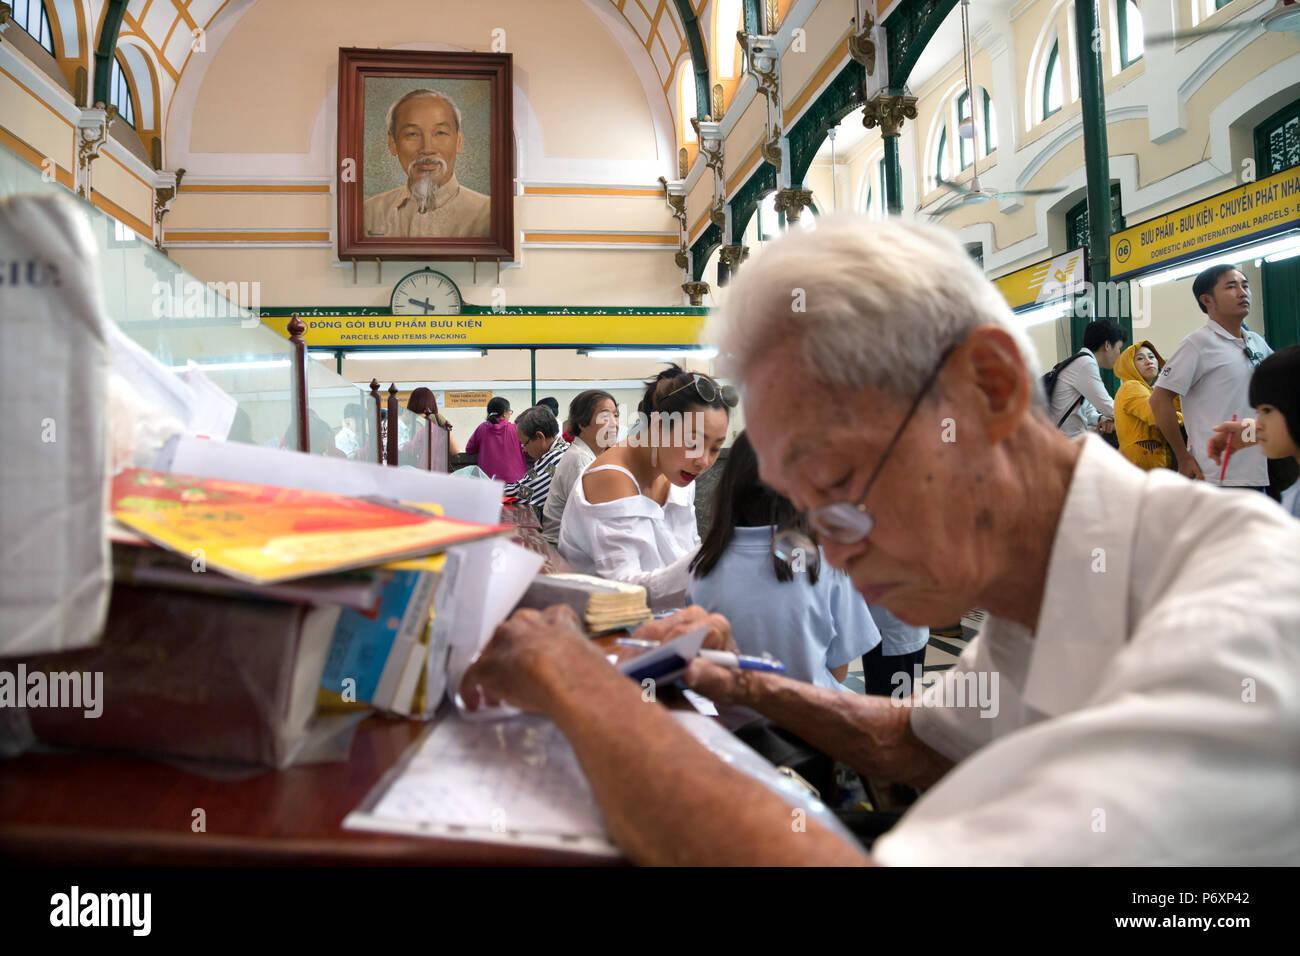 Crowd at Saigon - Hô Chi Minh post office, Vietnam - Stock Image